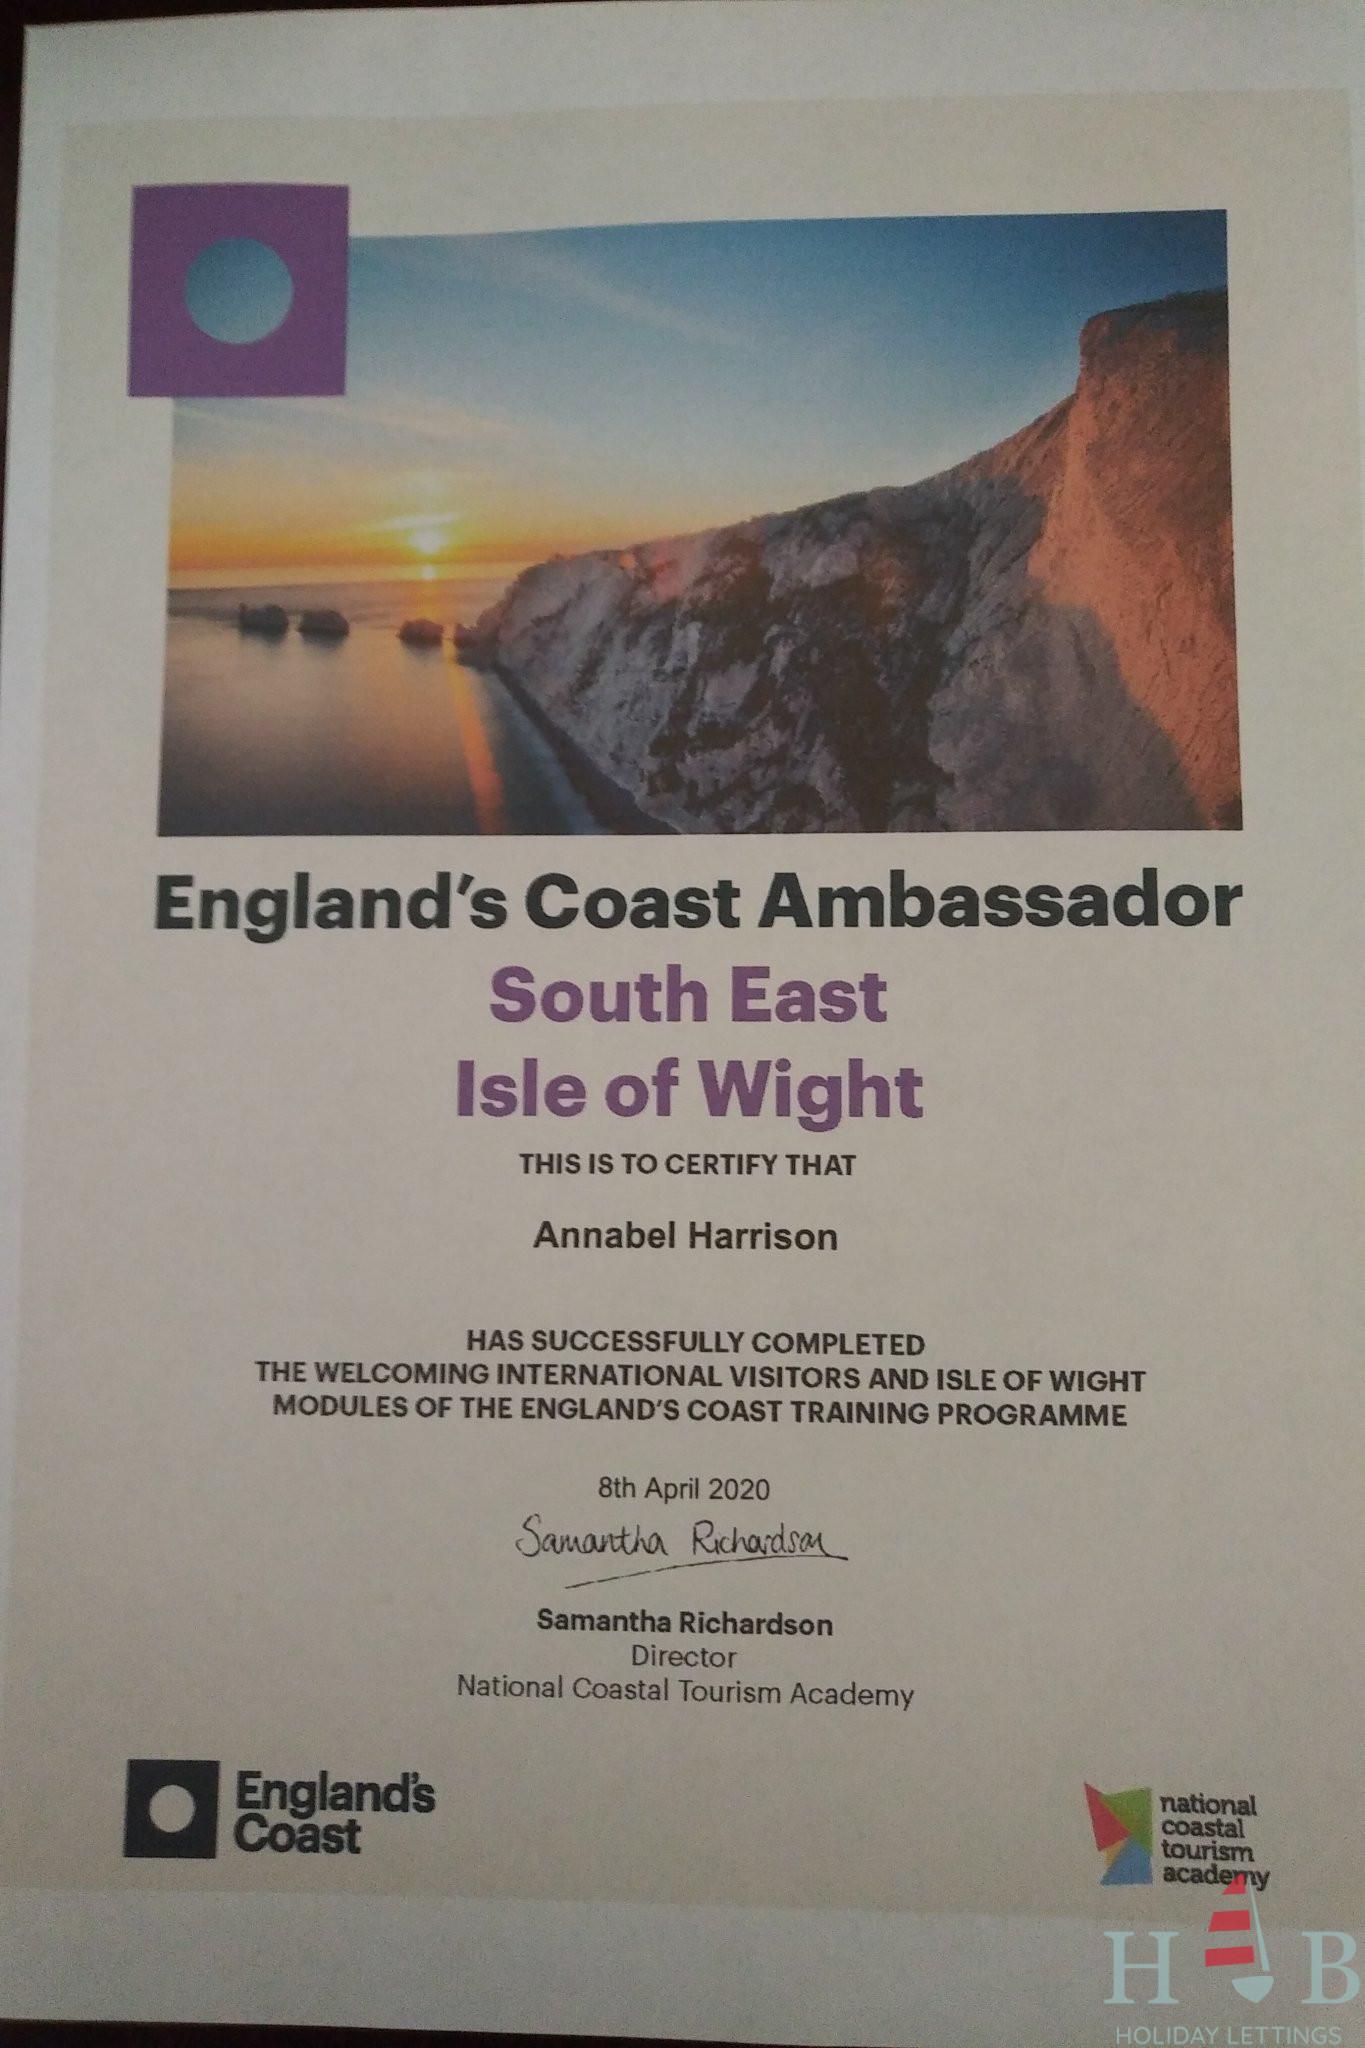 England's Coast Ambassador